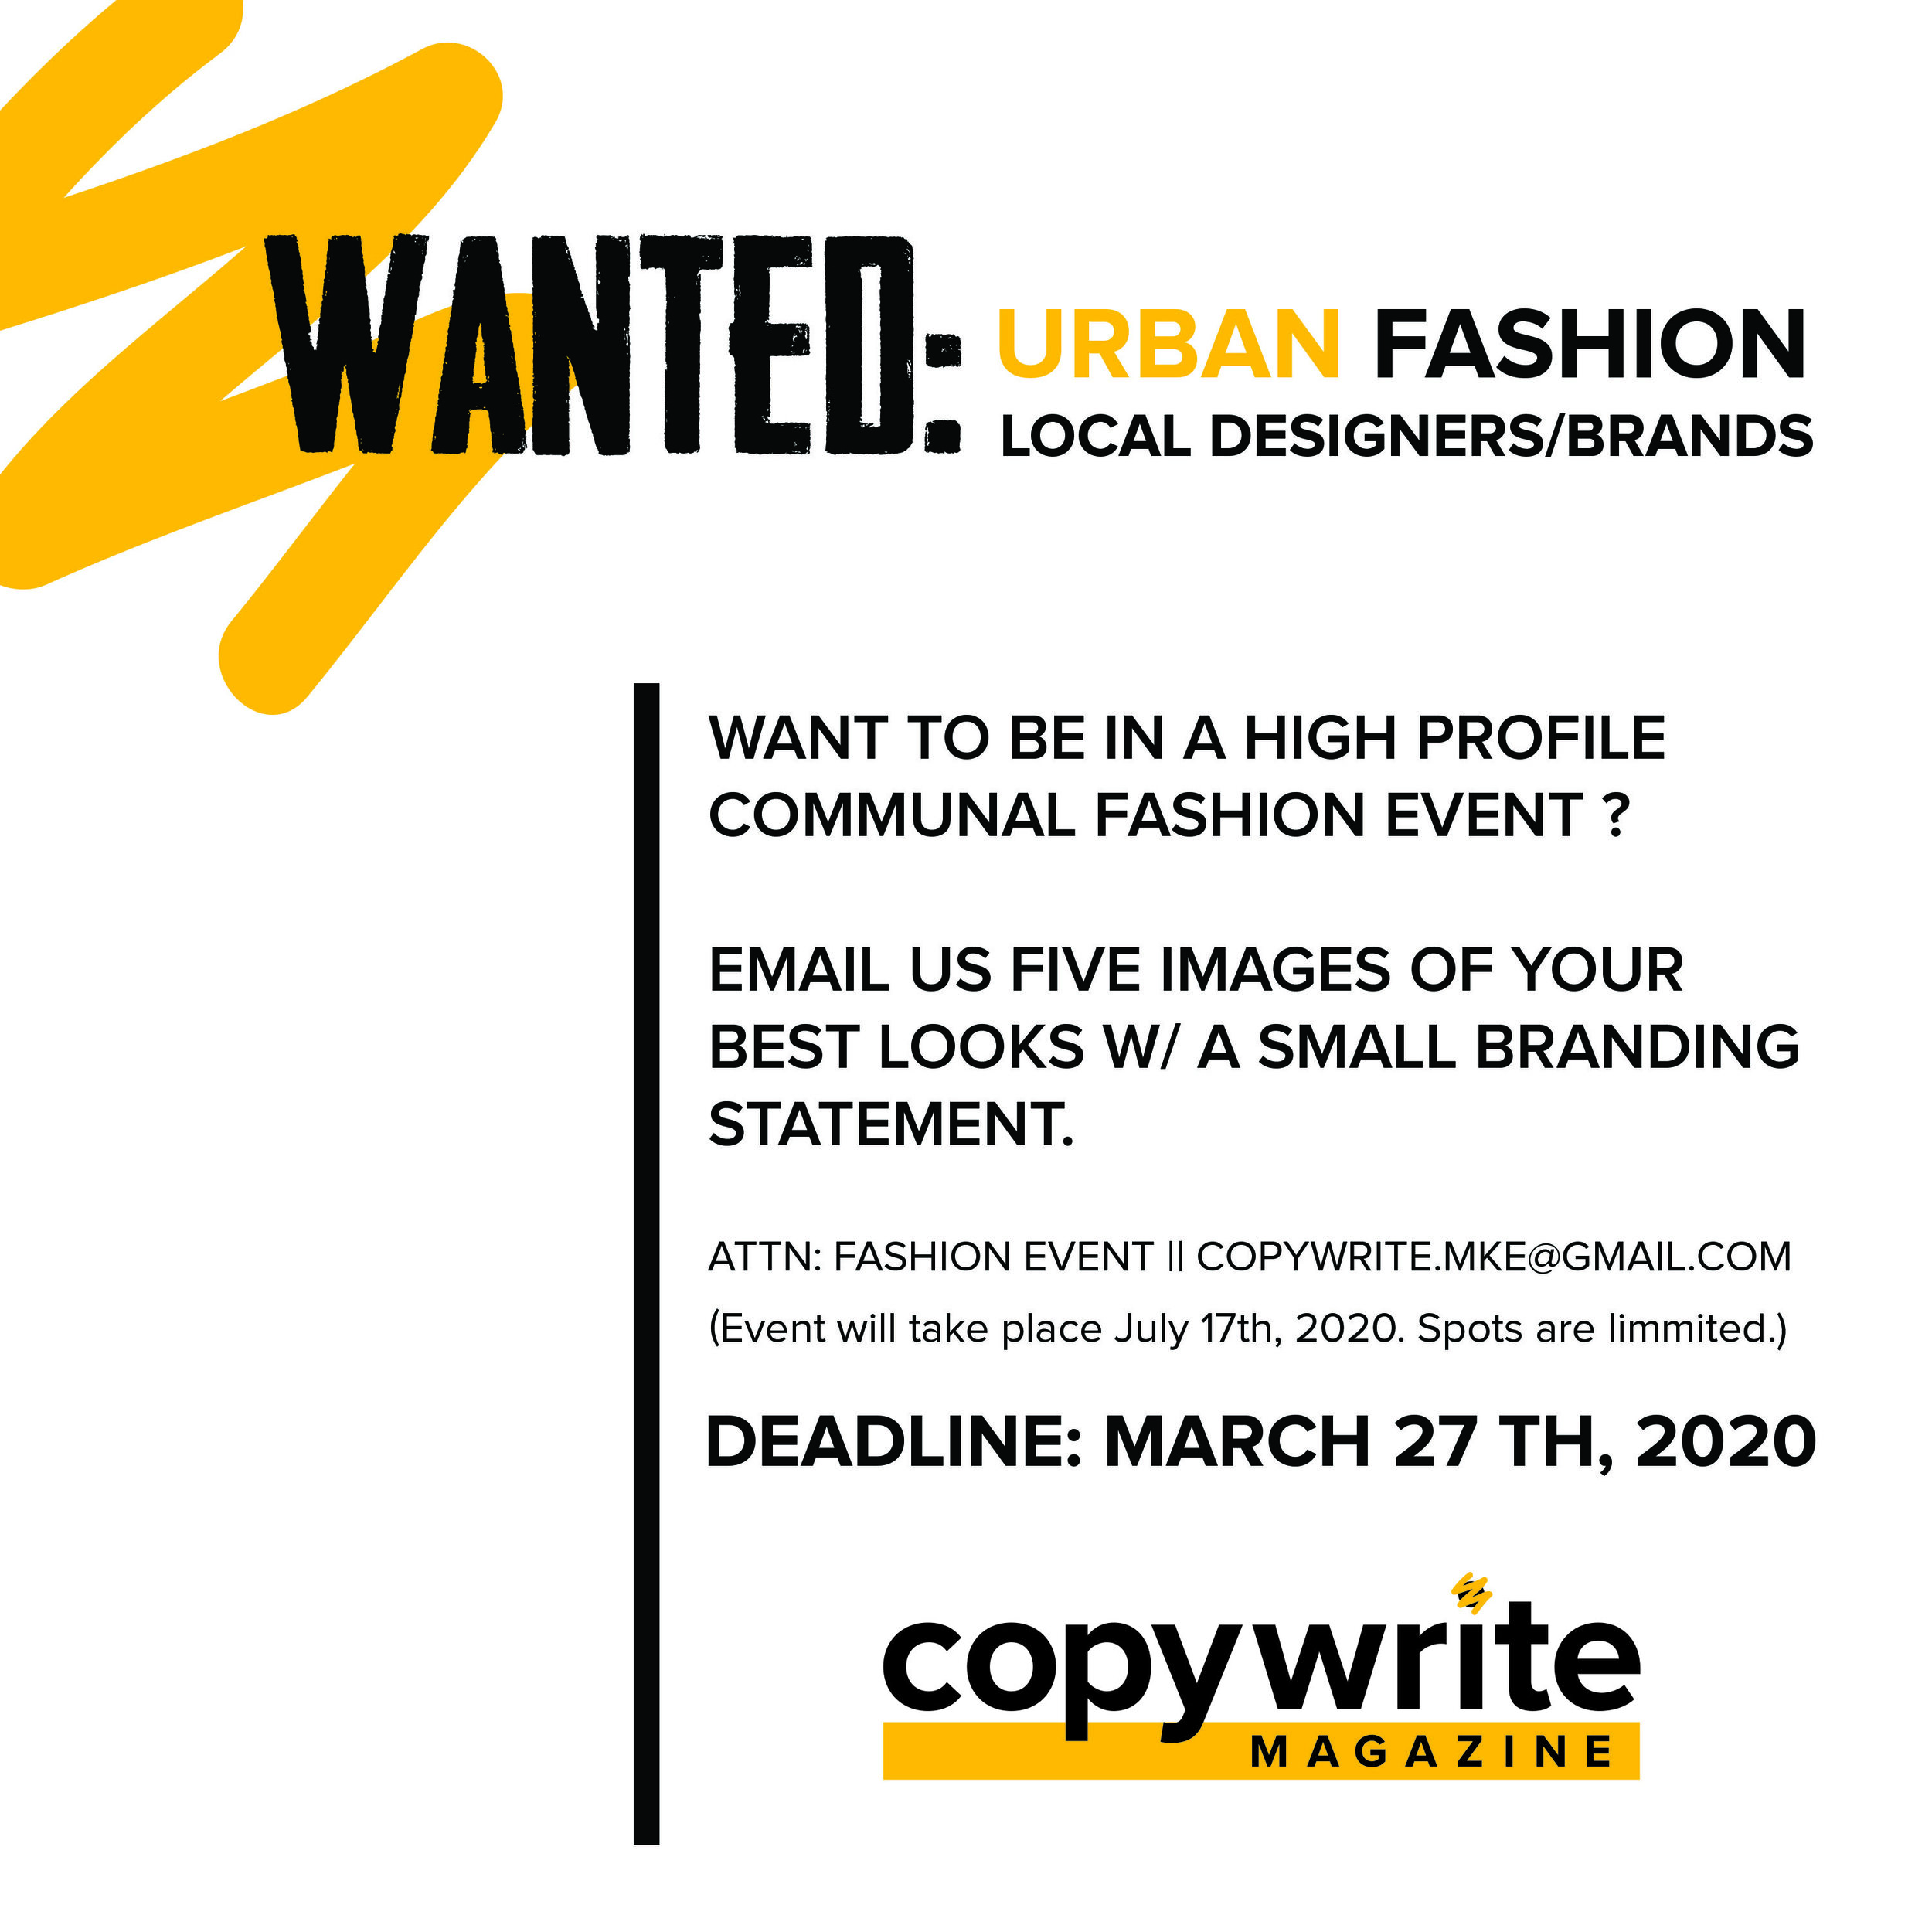 You Are Wanted Local Fashion Designers Brands Food Trucks Creative Vendors Copywrite Magazine